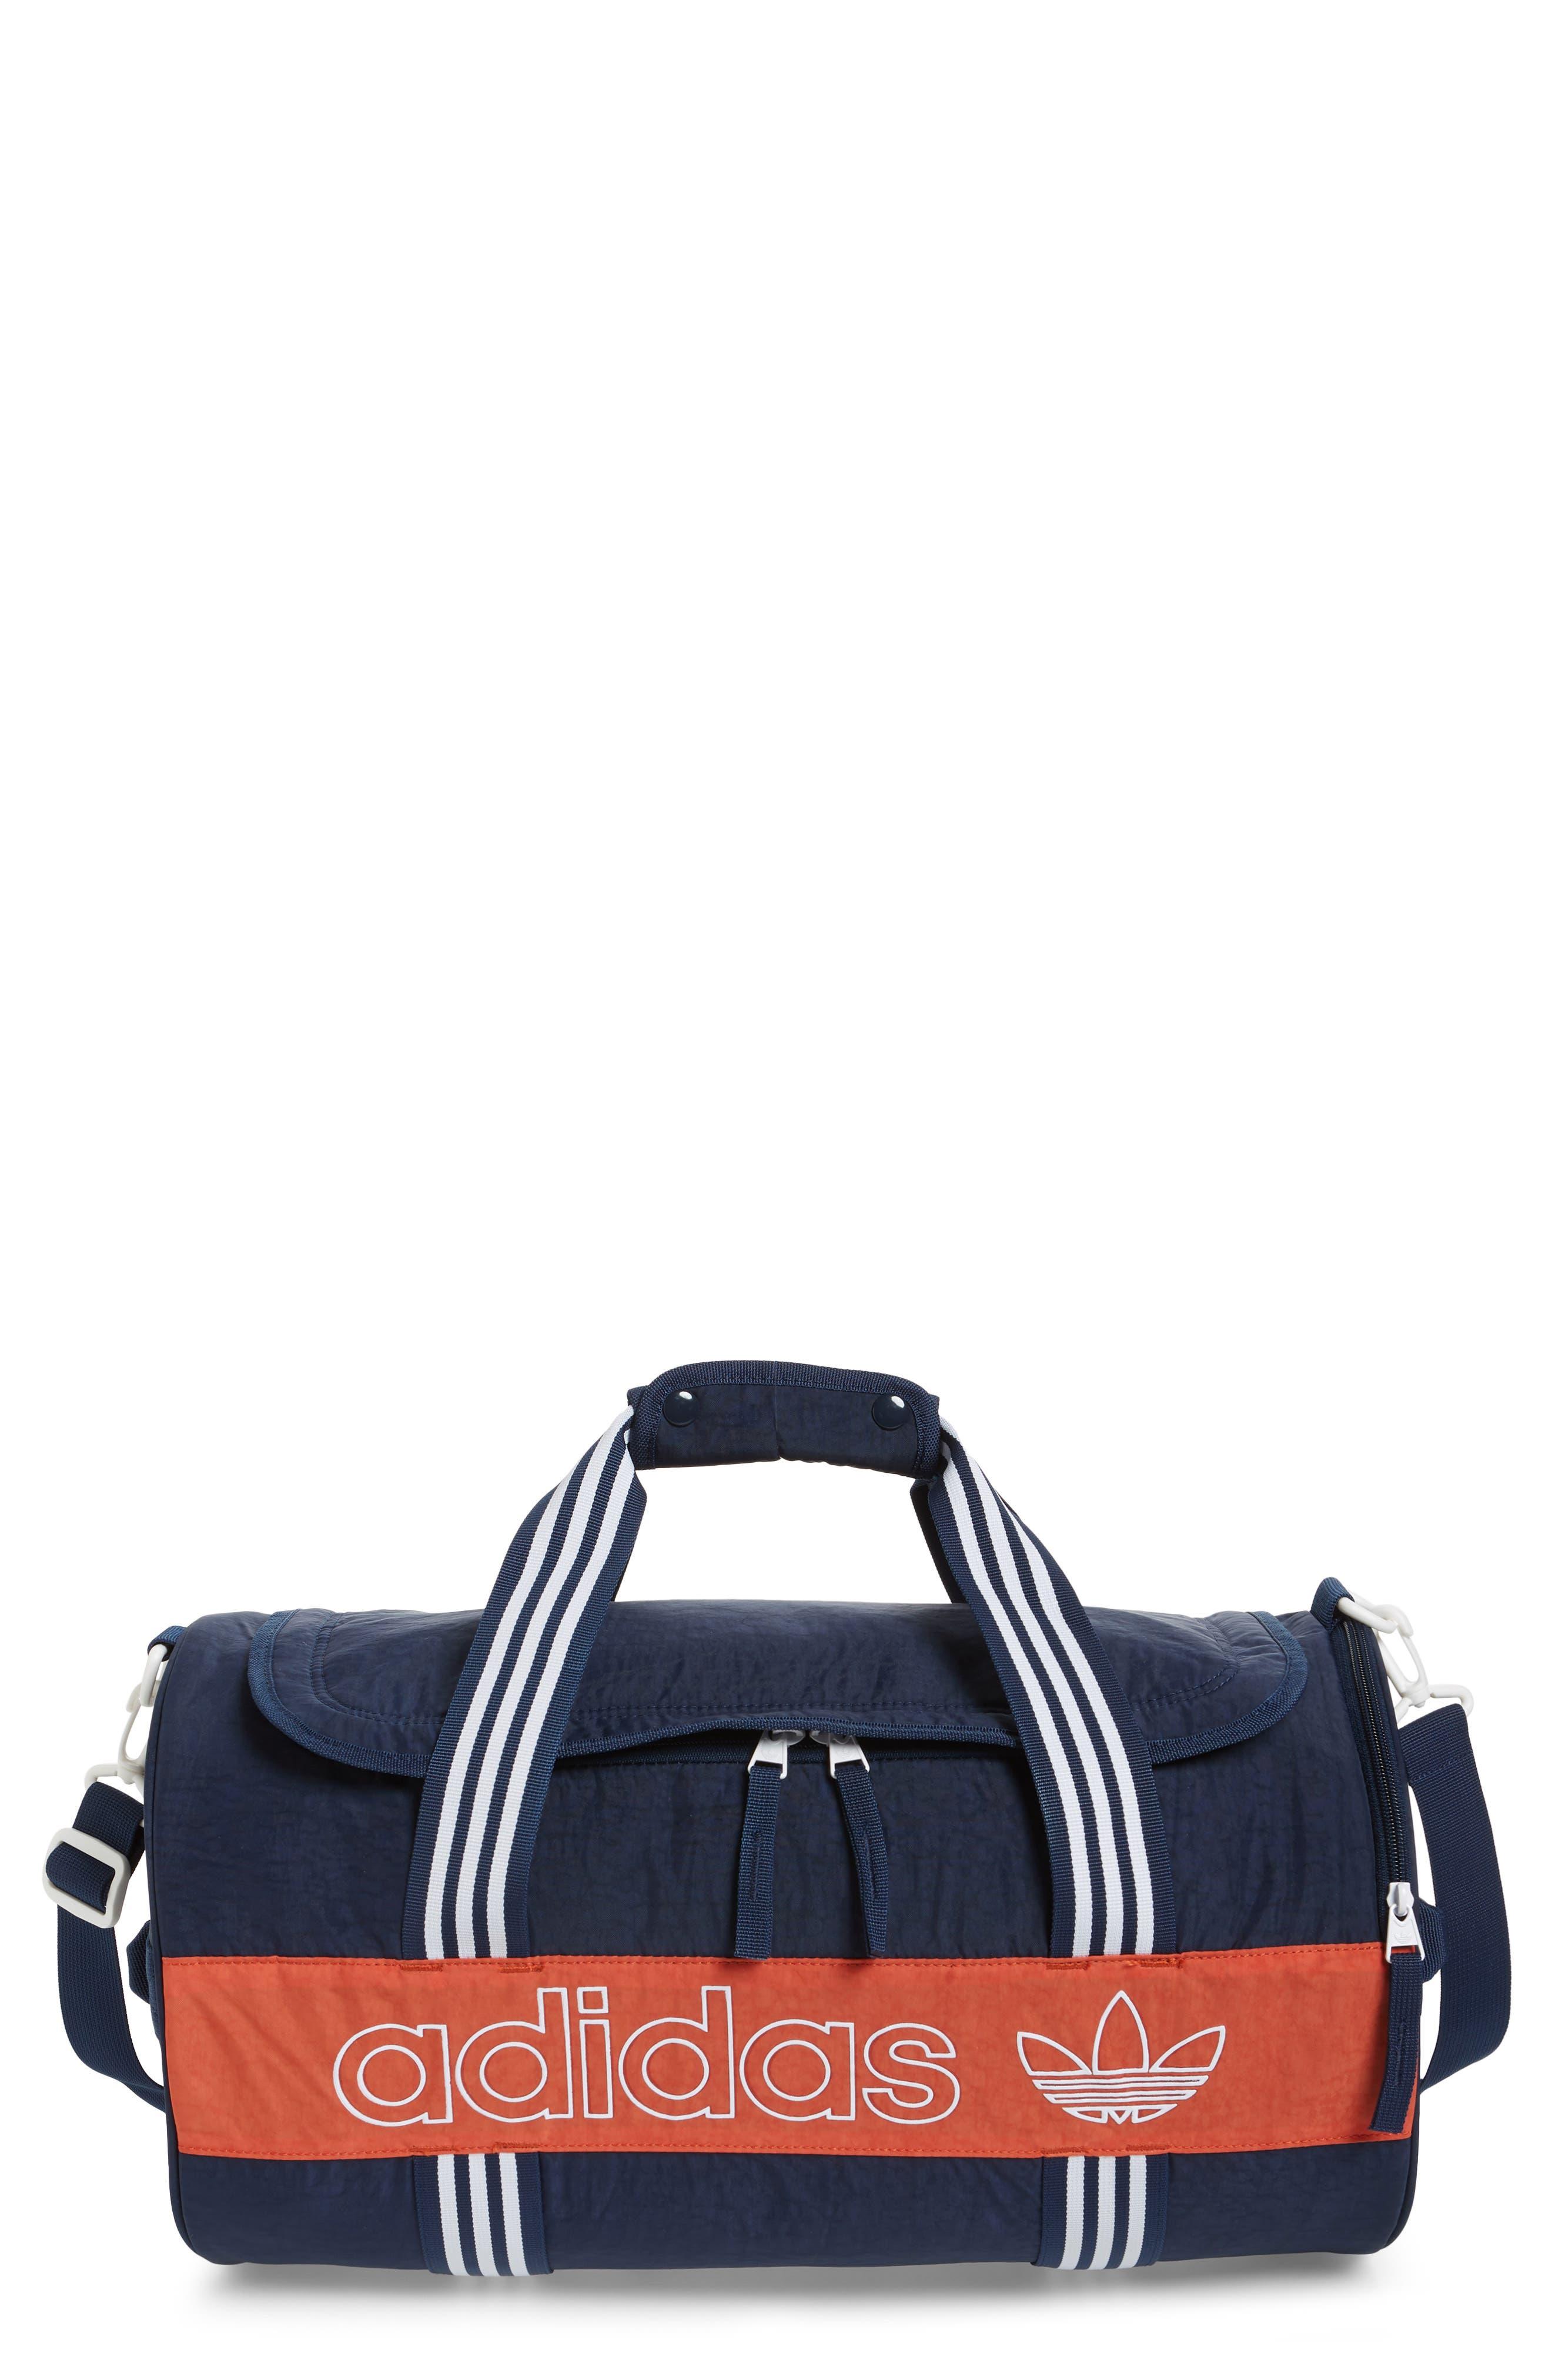 ADIDAS ORIGINALS, adidas Spirit Roll Duffle Bag, Main thumbnail 1, color, COLLEGIATE NAVY/ AMBER/ WHITE